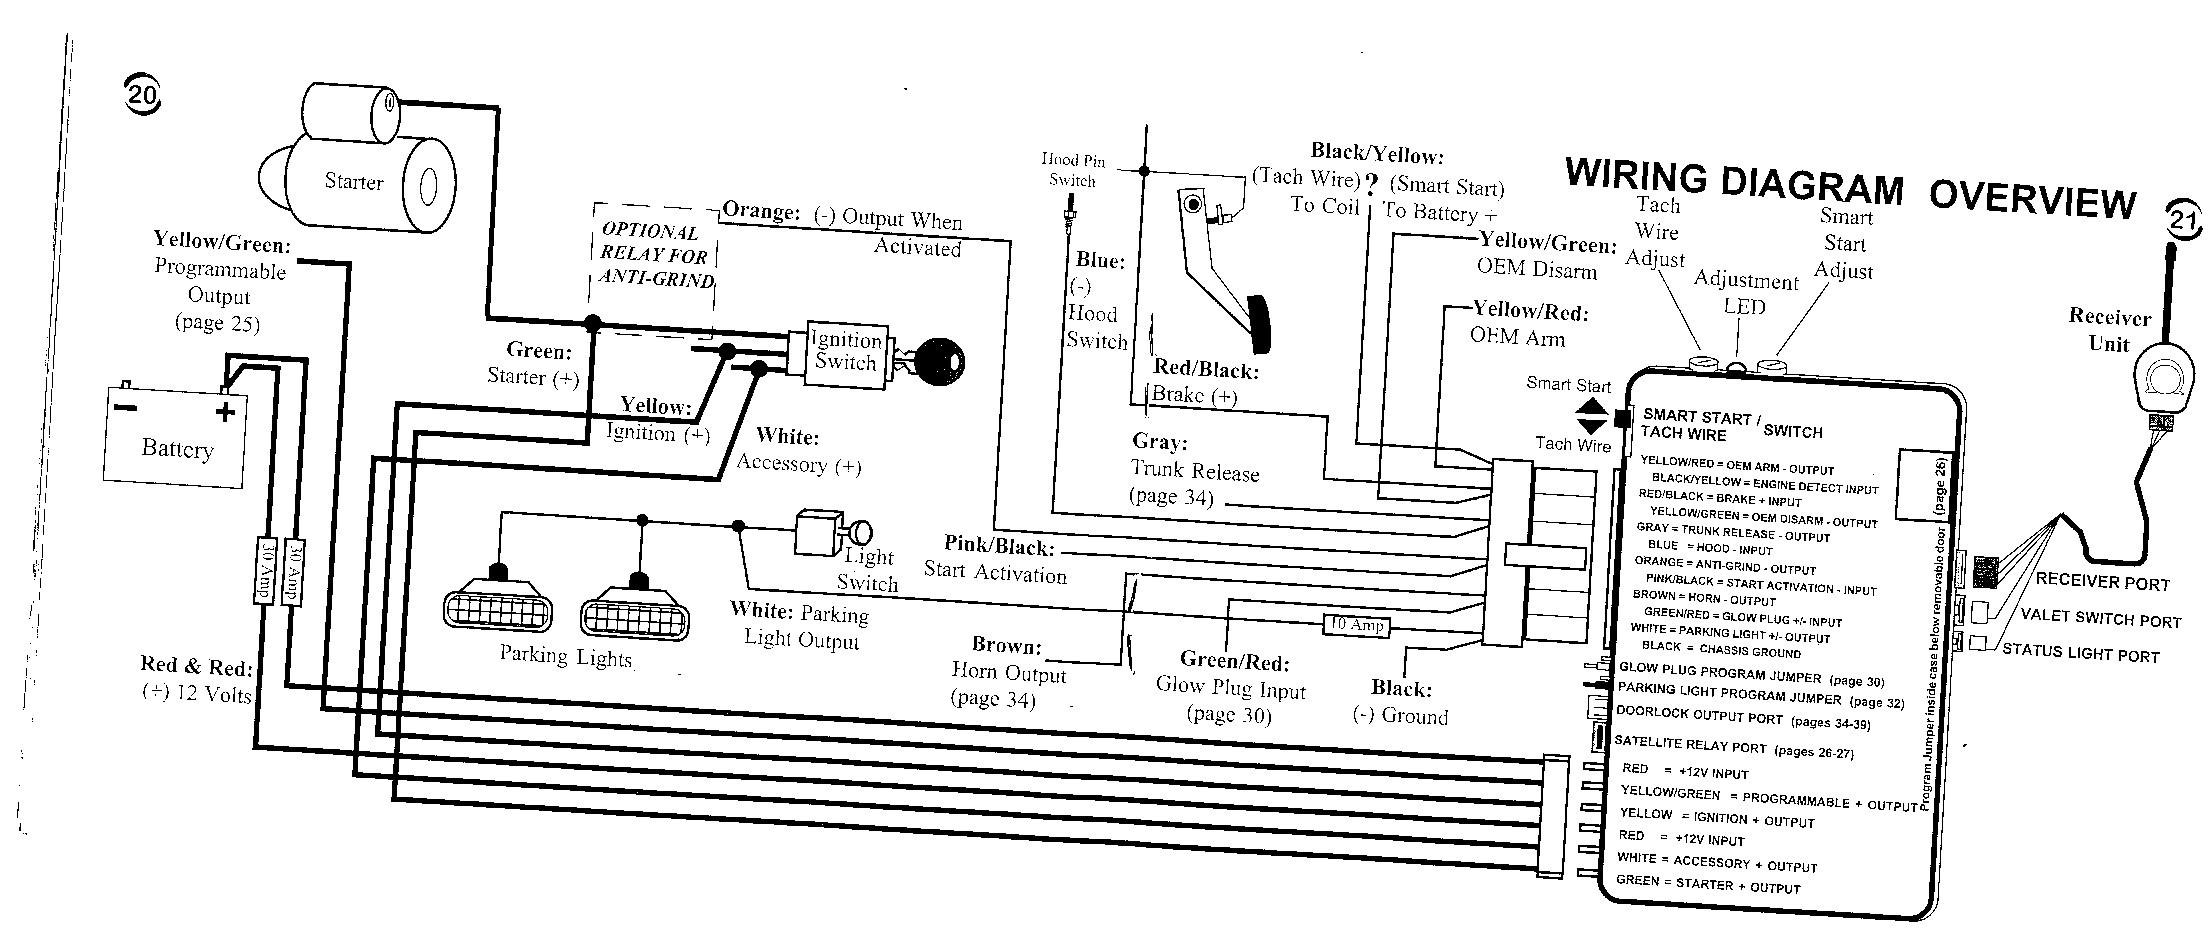 Viper 5706v Installation Manual Pdf Viper 5706v Wiring Diagram Pdf Hanenhuusholli Of Viper 5706v Installation Manual Pdf